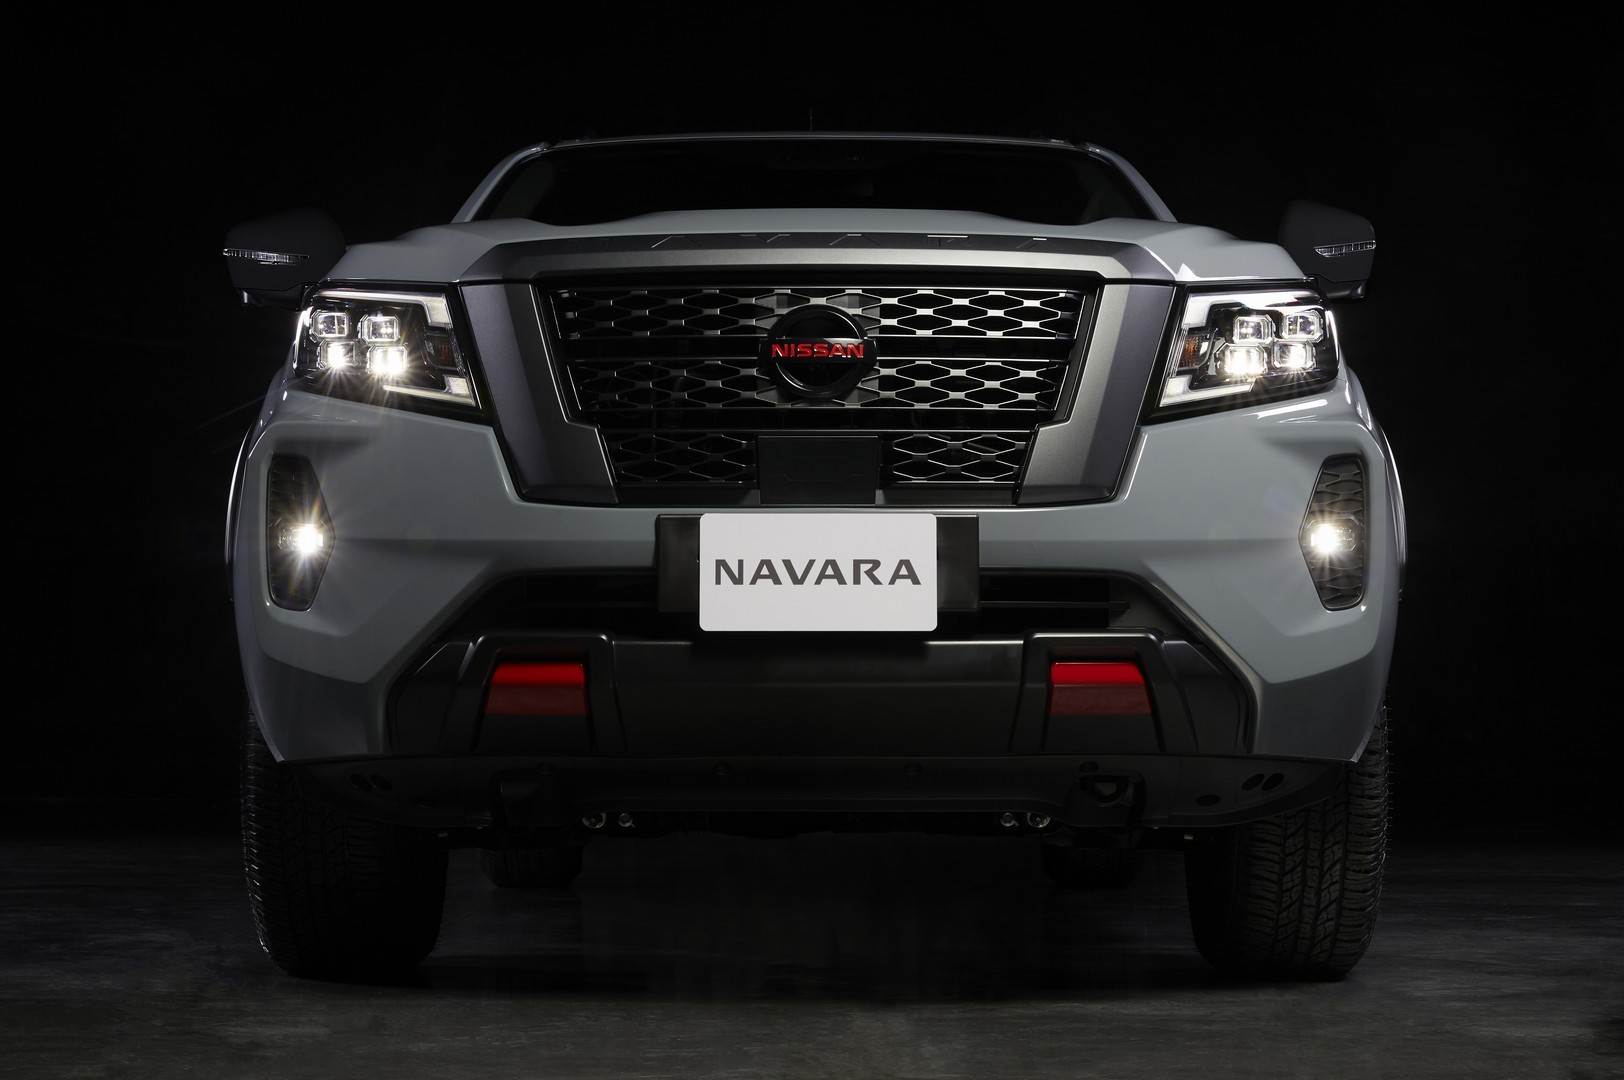 Nissan-Navara-2021-facelift-7